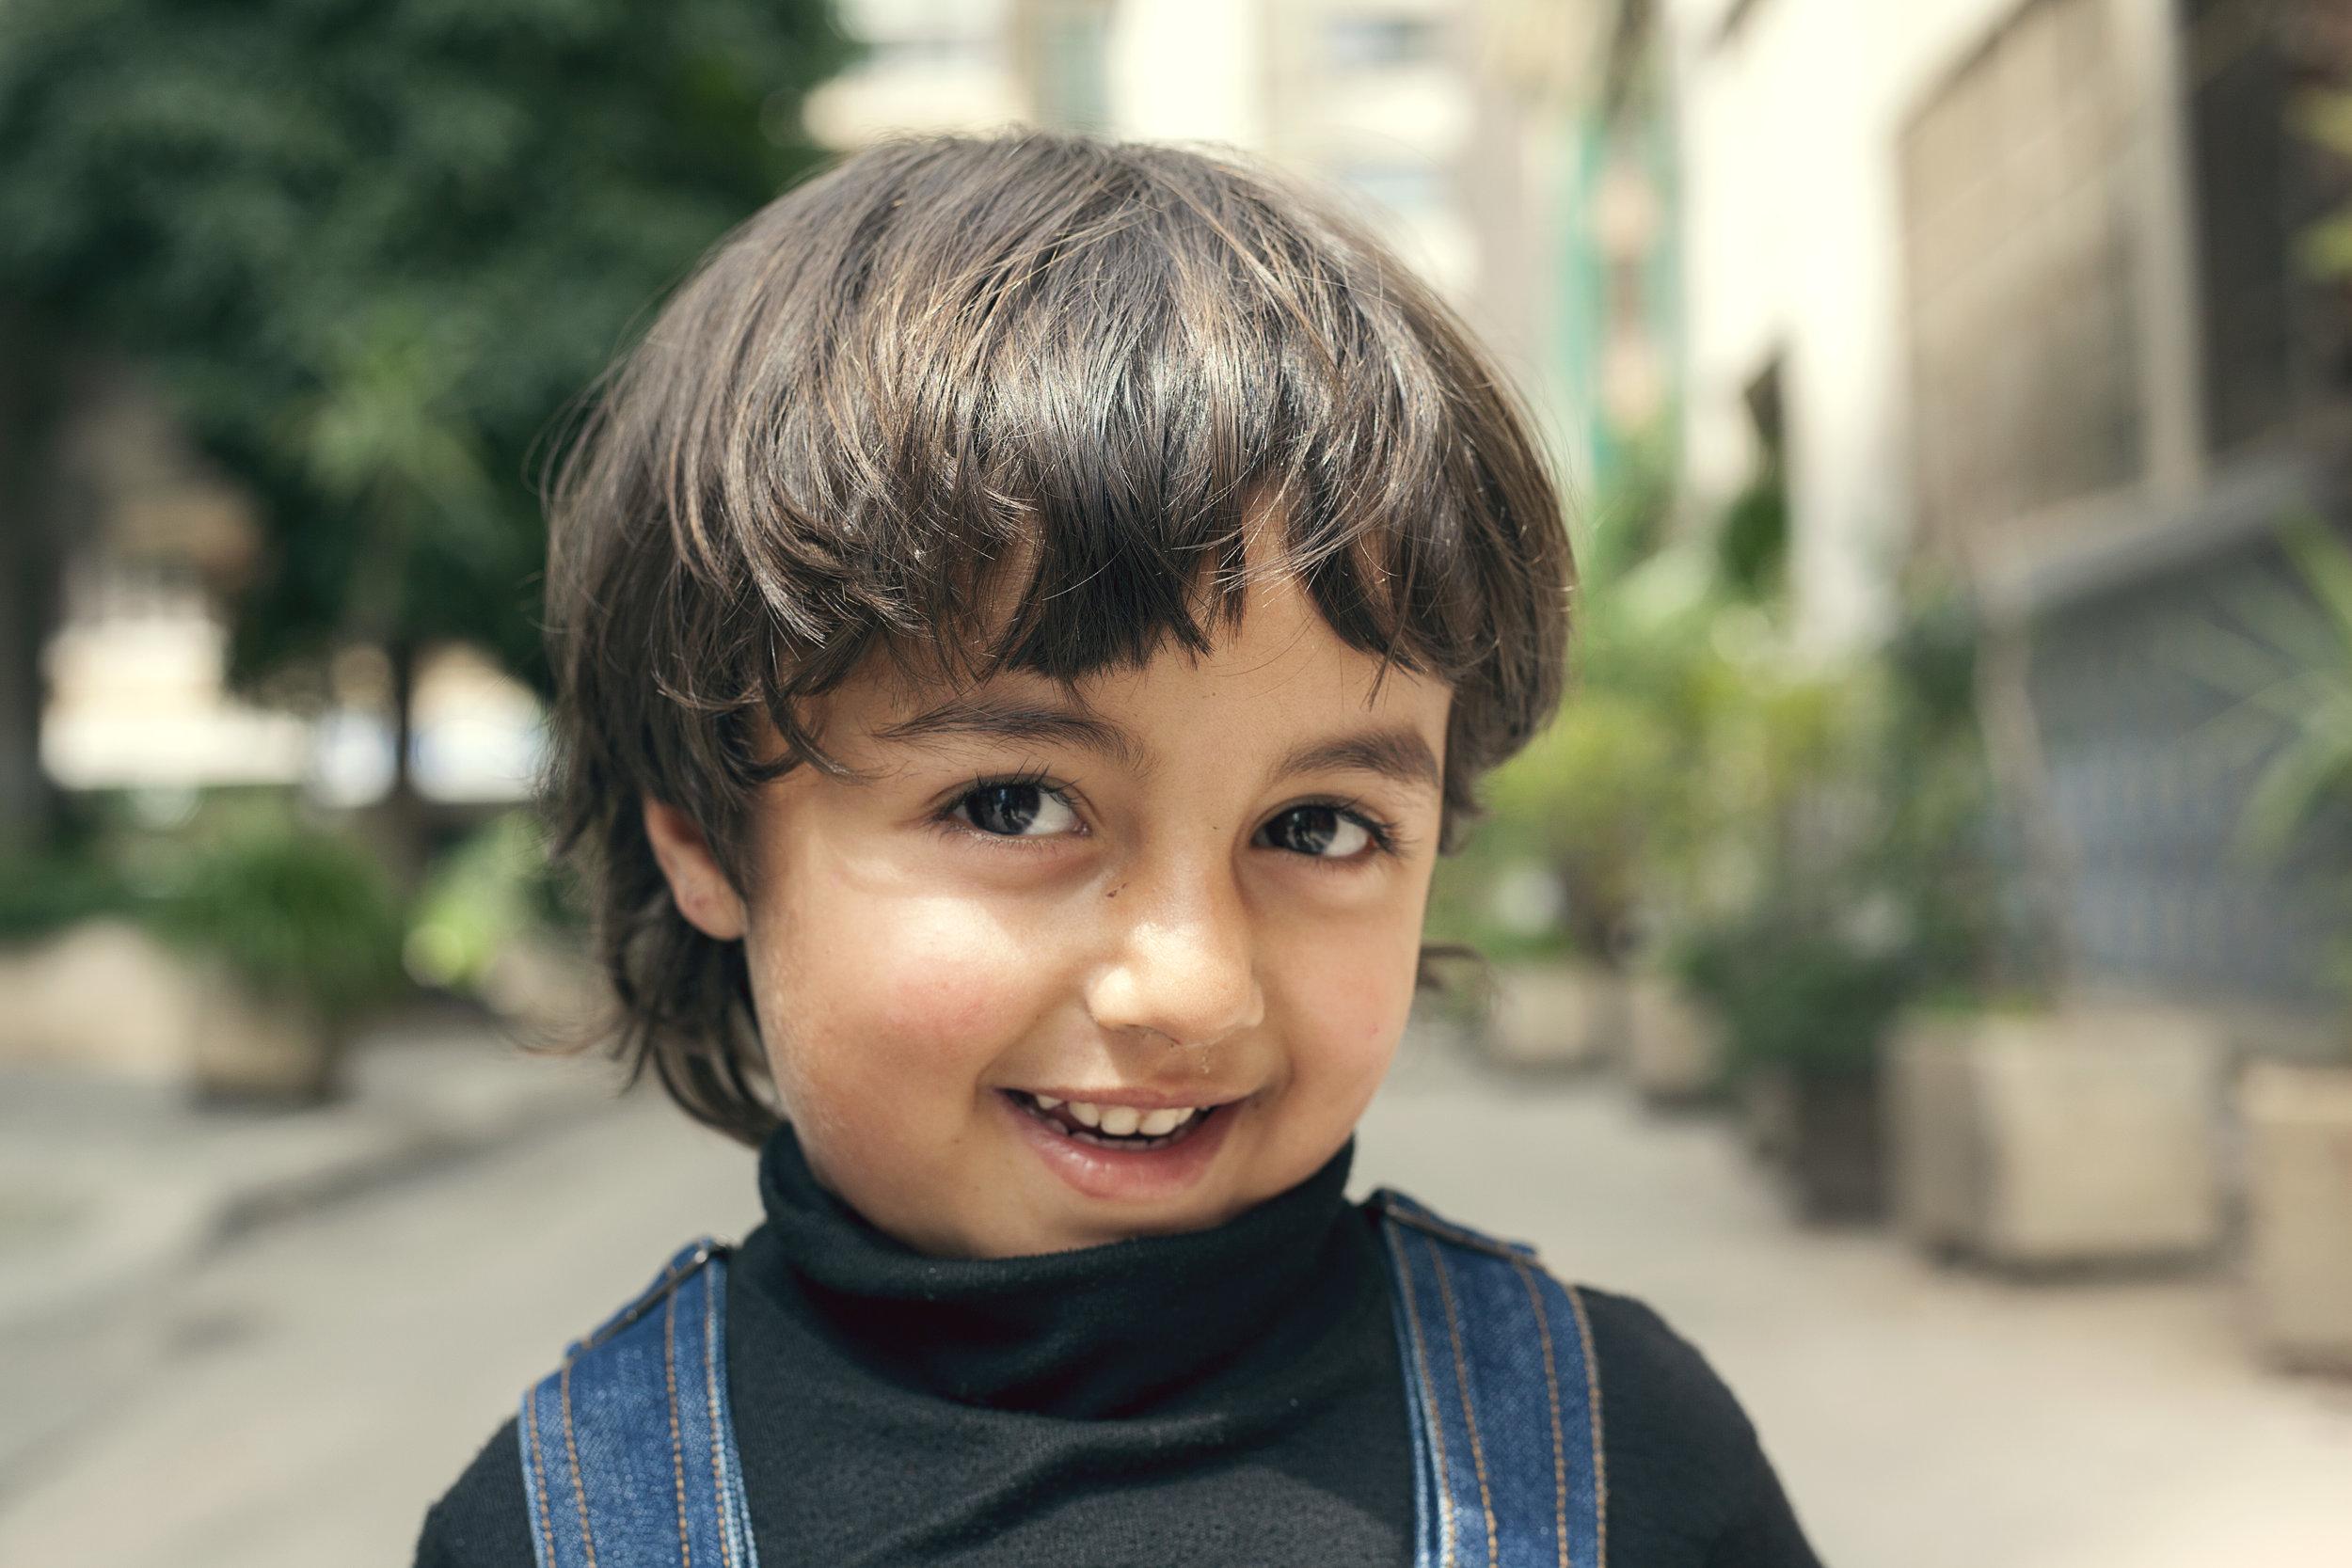 Seif Syrian refugee INARA Arwa Damon